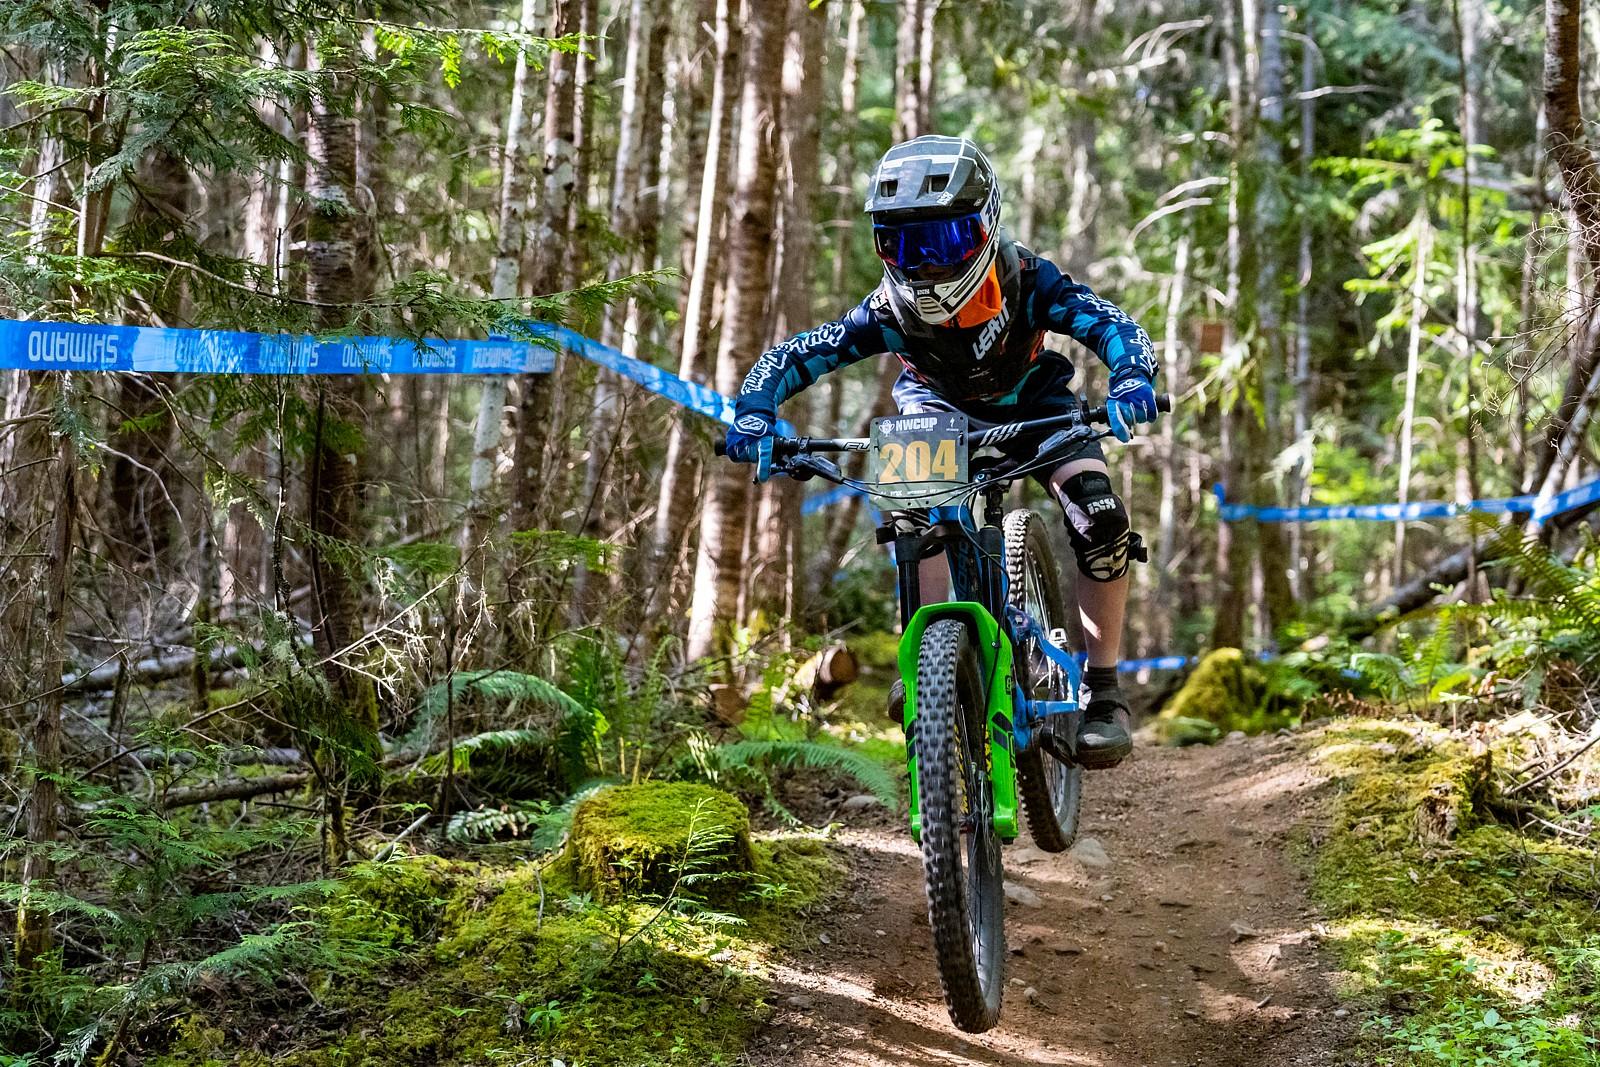 Owen Dixon - Zuestman - Mountain Biking Pictures - Vital MTB